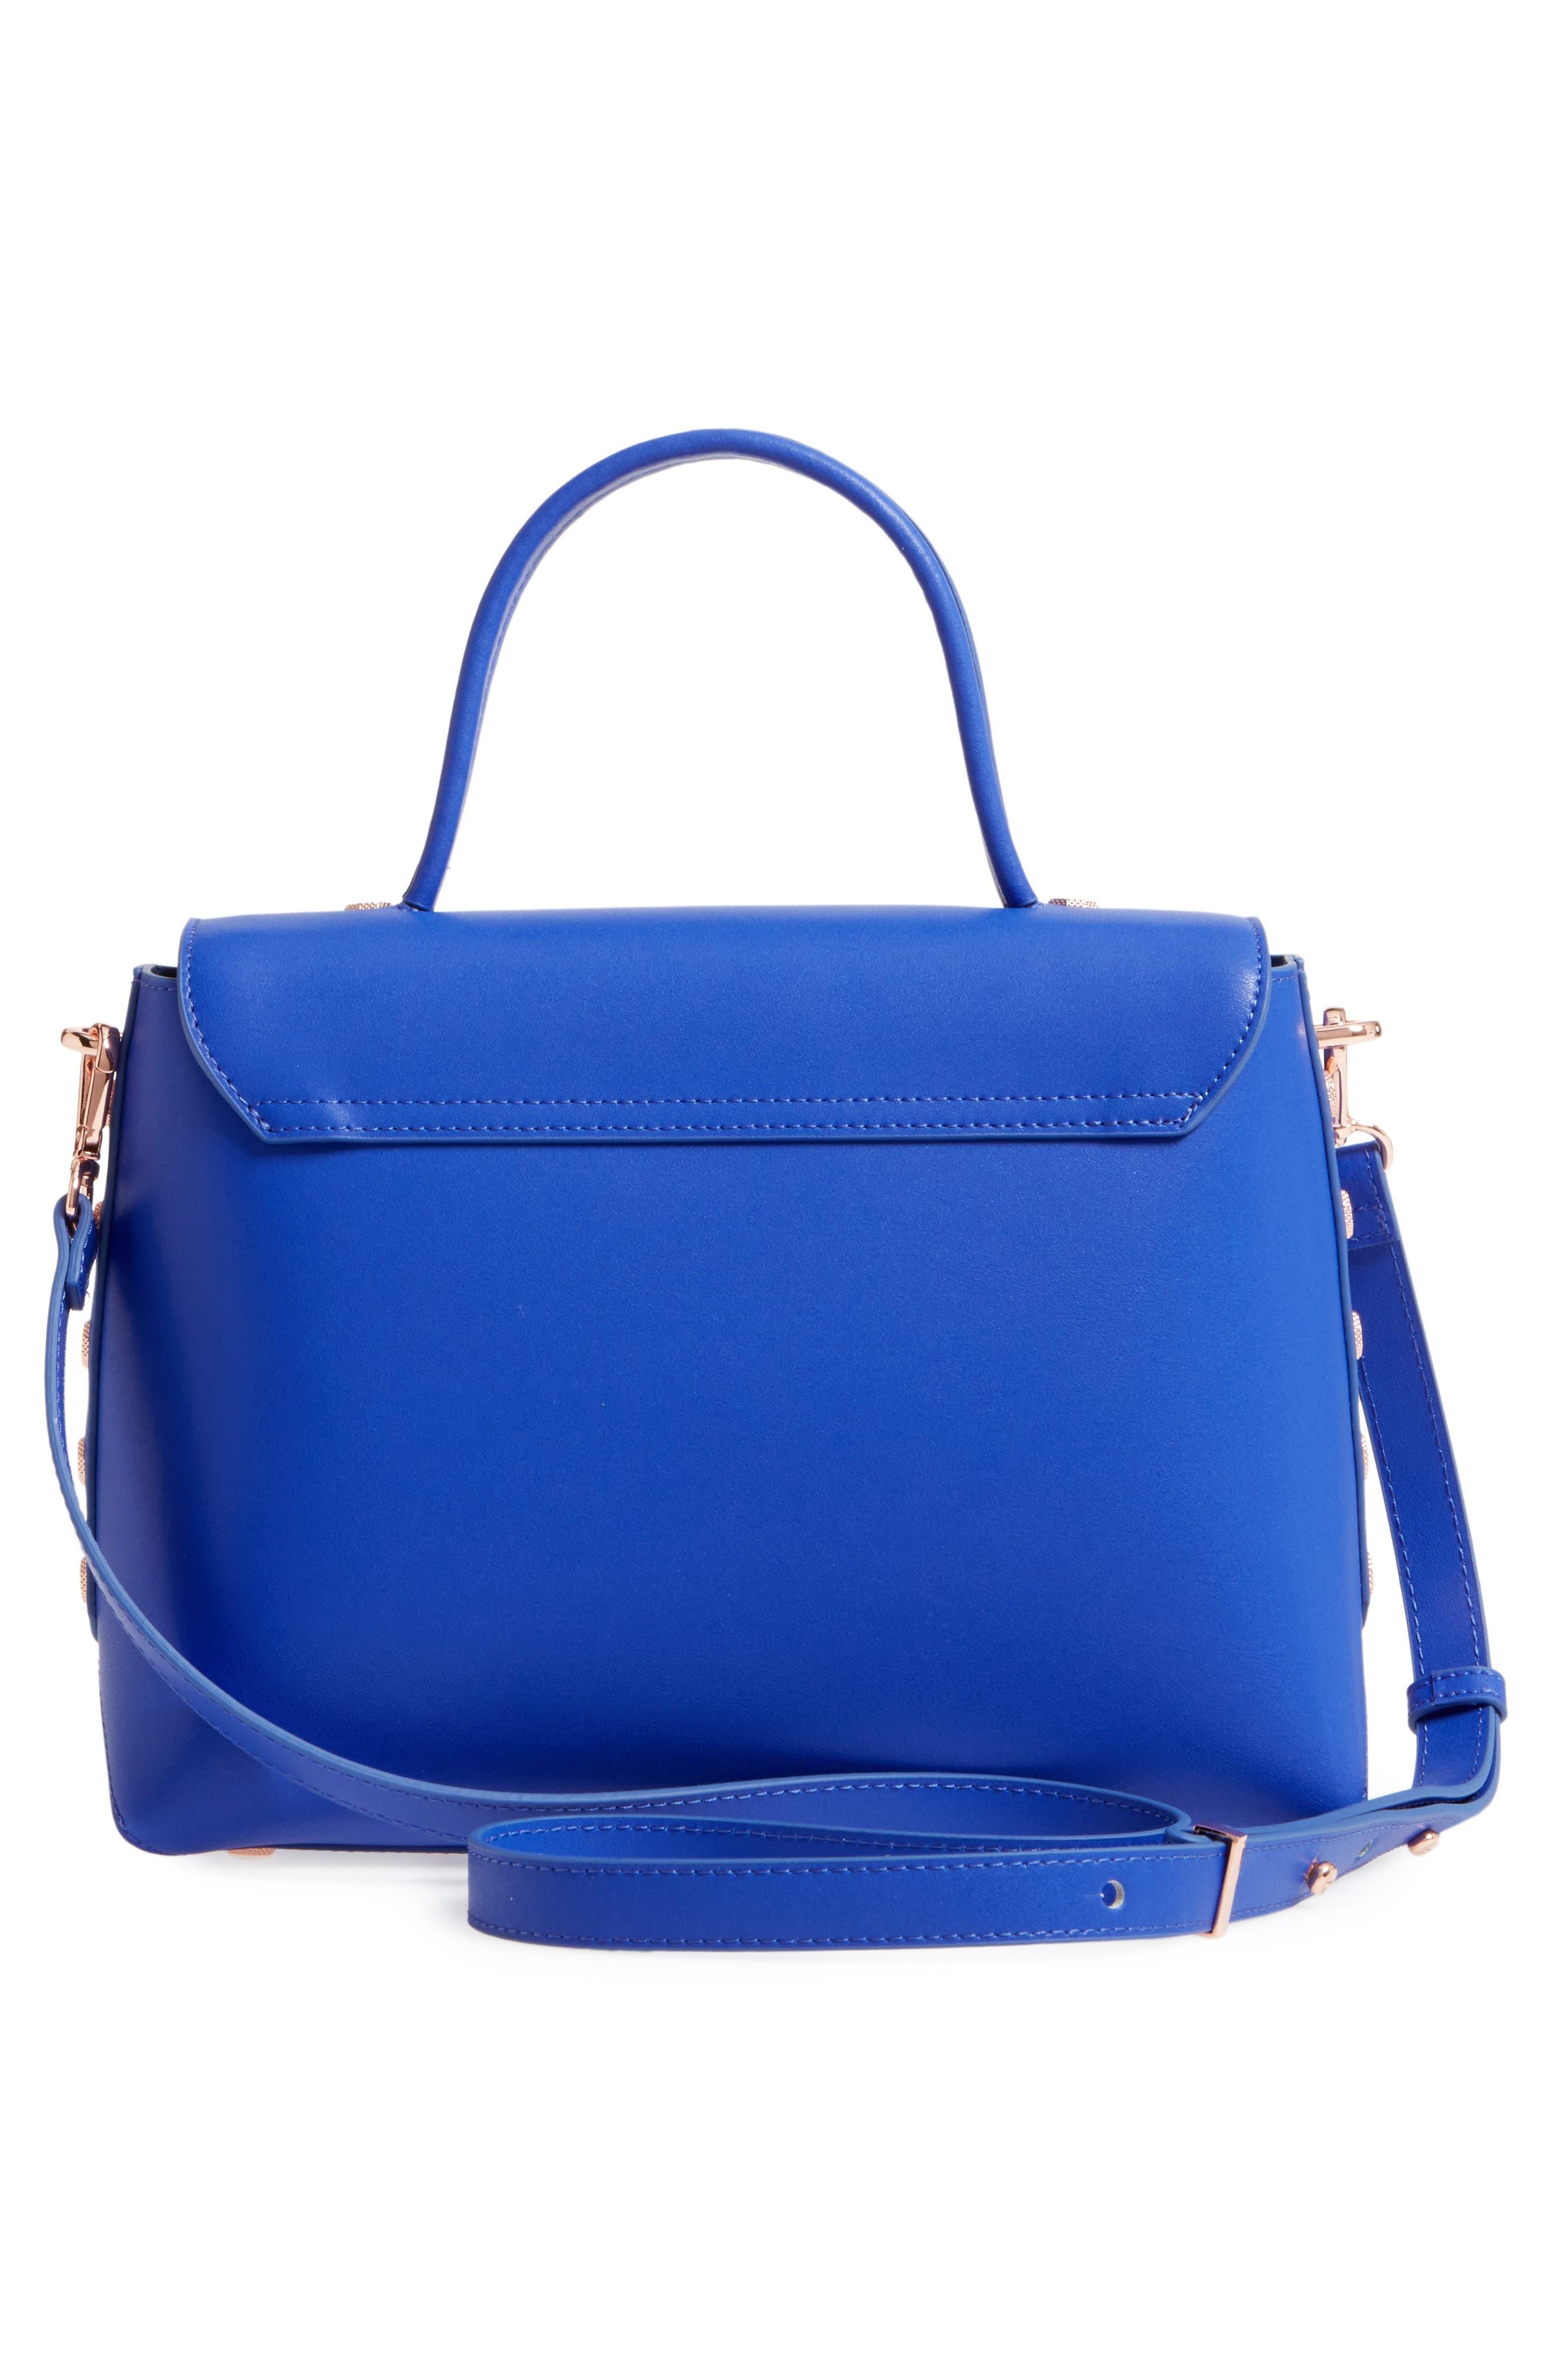 Alternate Image 2  - Ted Baker London Taymar - Studded Edge Lady Bag Leather Top Handle Satchel